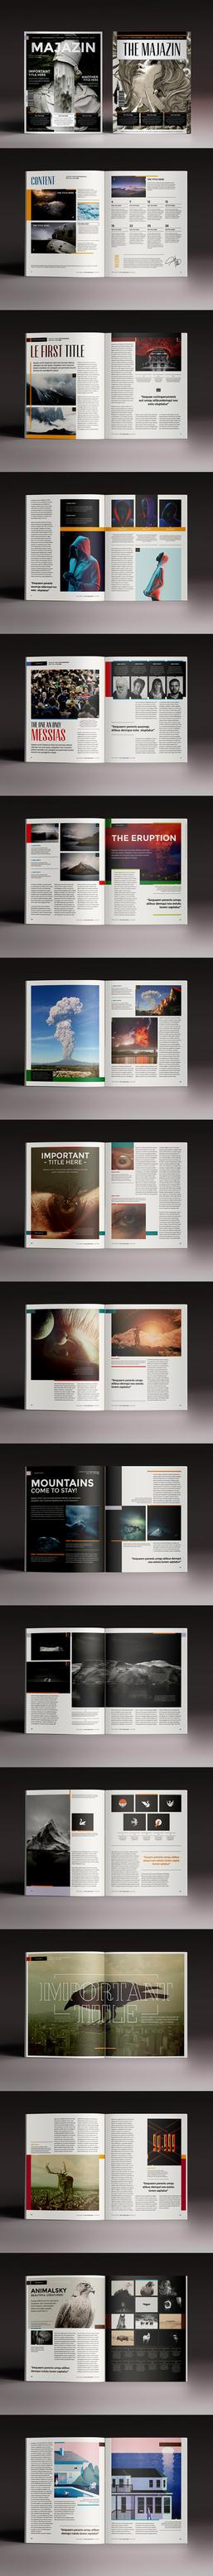 Multipurpose Magazine 5 by luuqas